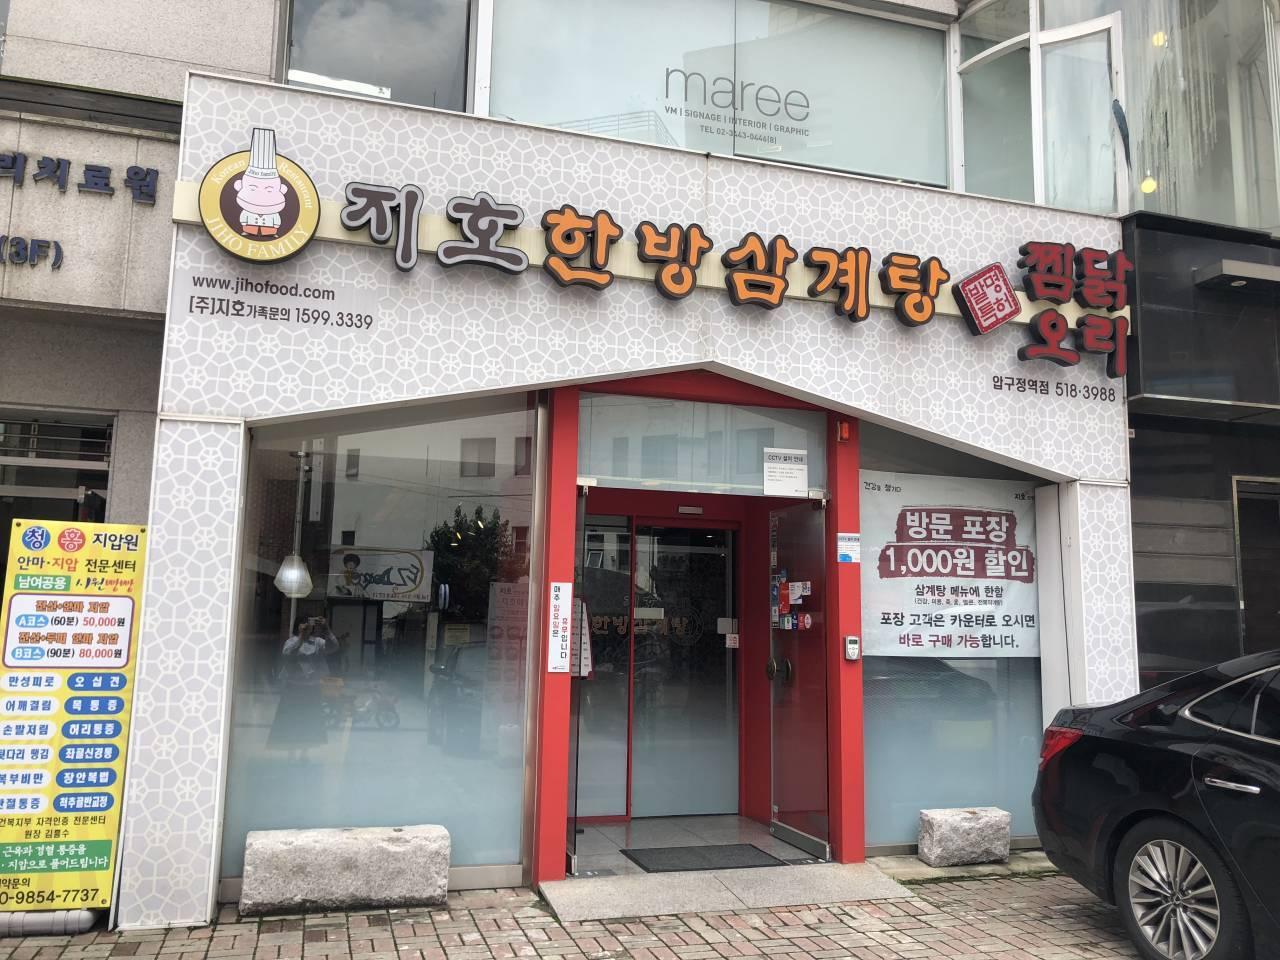 Jiho Hanbang Samgyetang Aapgujeong Station (지호한방삼계탕 압구정역)